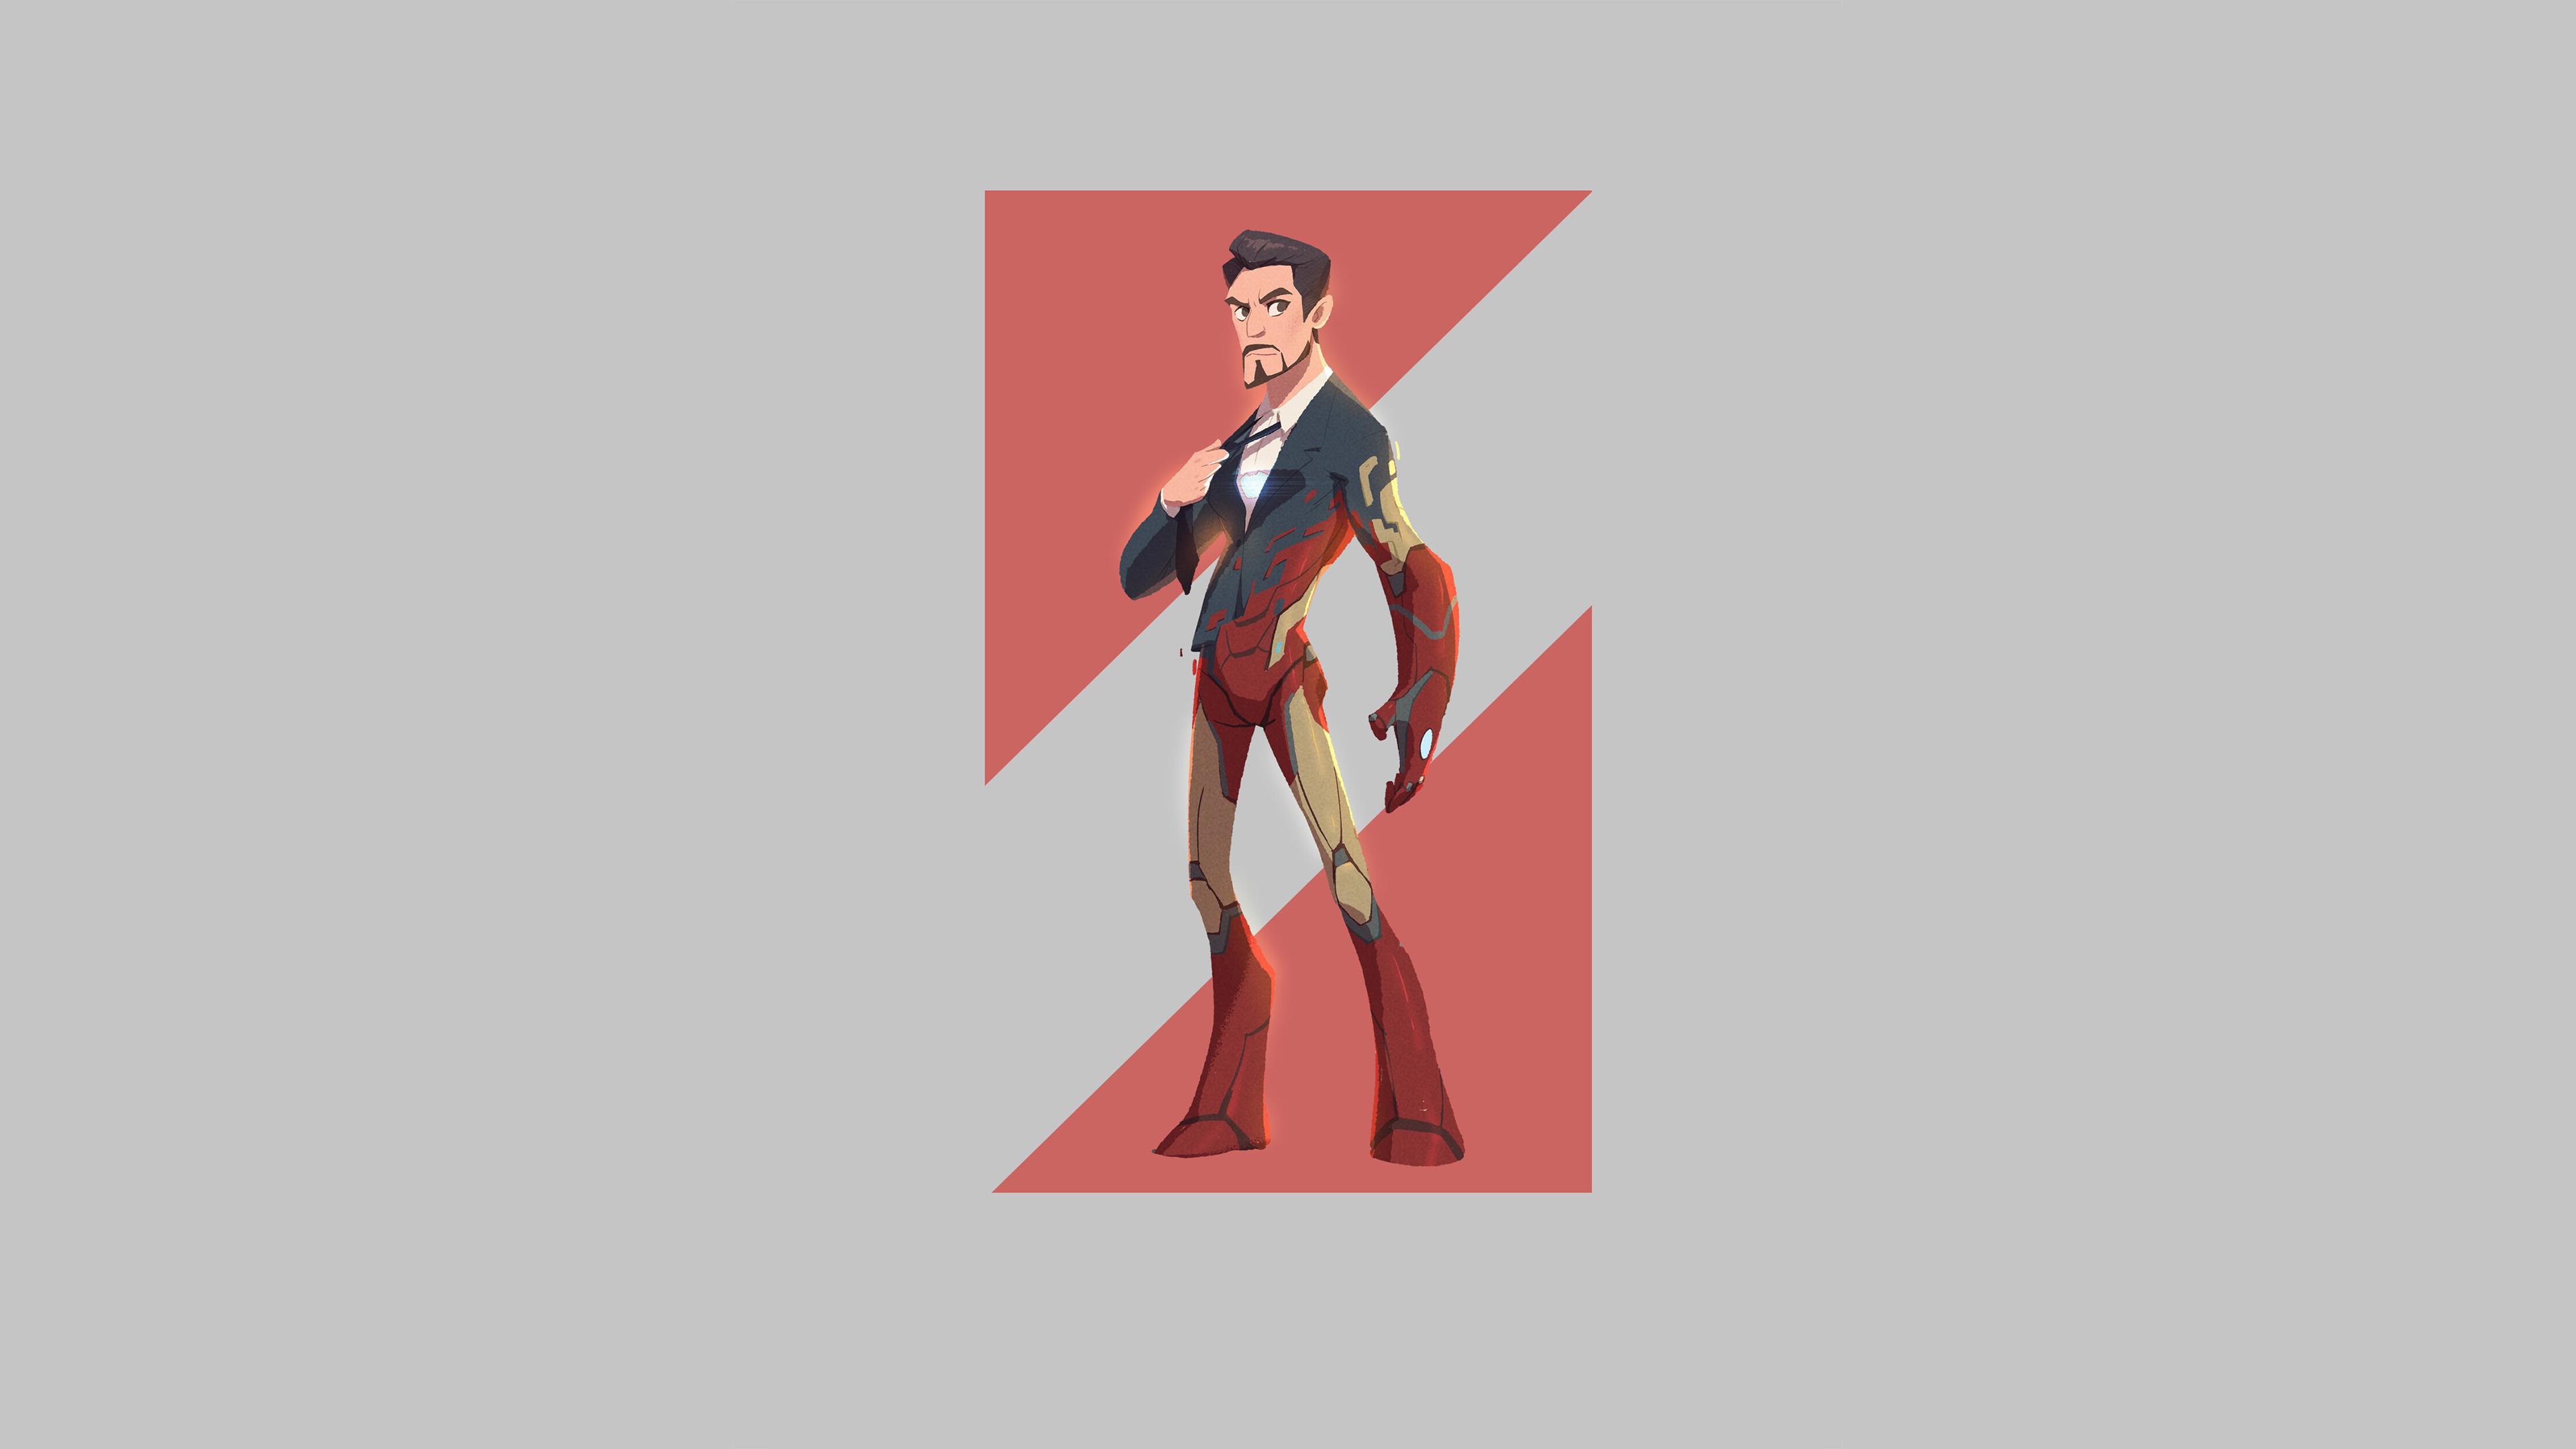 iron man minimal 1580585429 - Iron Man Minimal - Iron Man Minimal wallpapers, Iron Man minimal phone wallpapers 4k, Iron Man Minimal 4k wallpapers